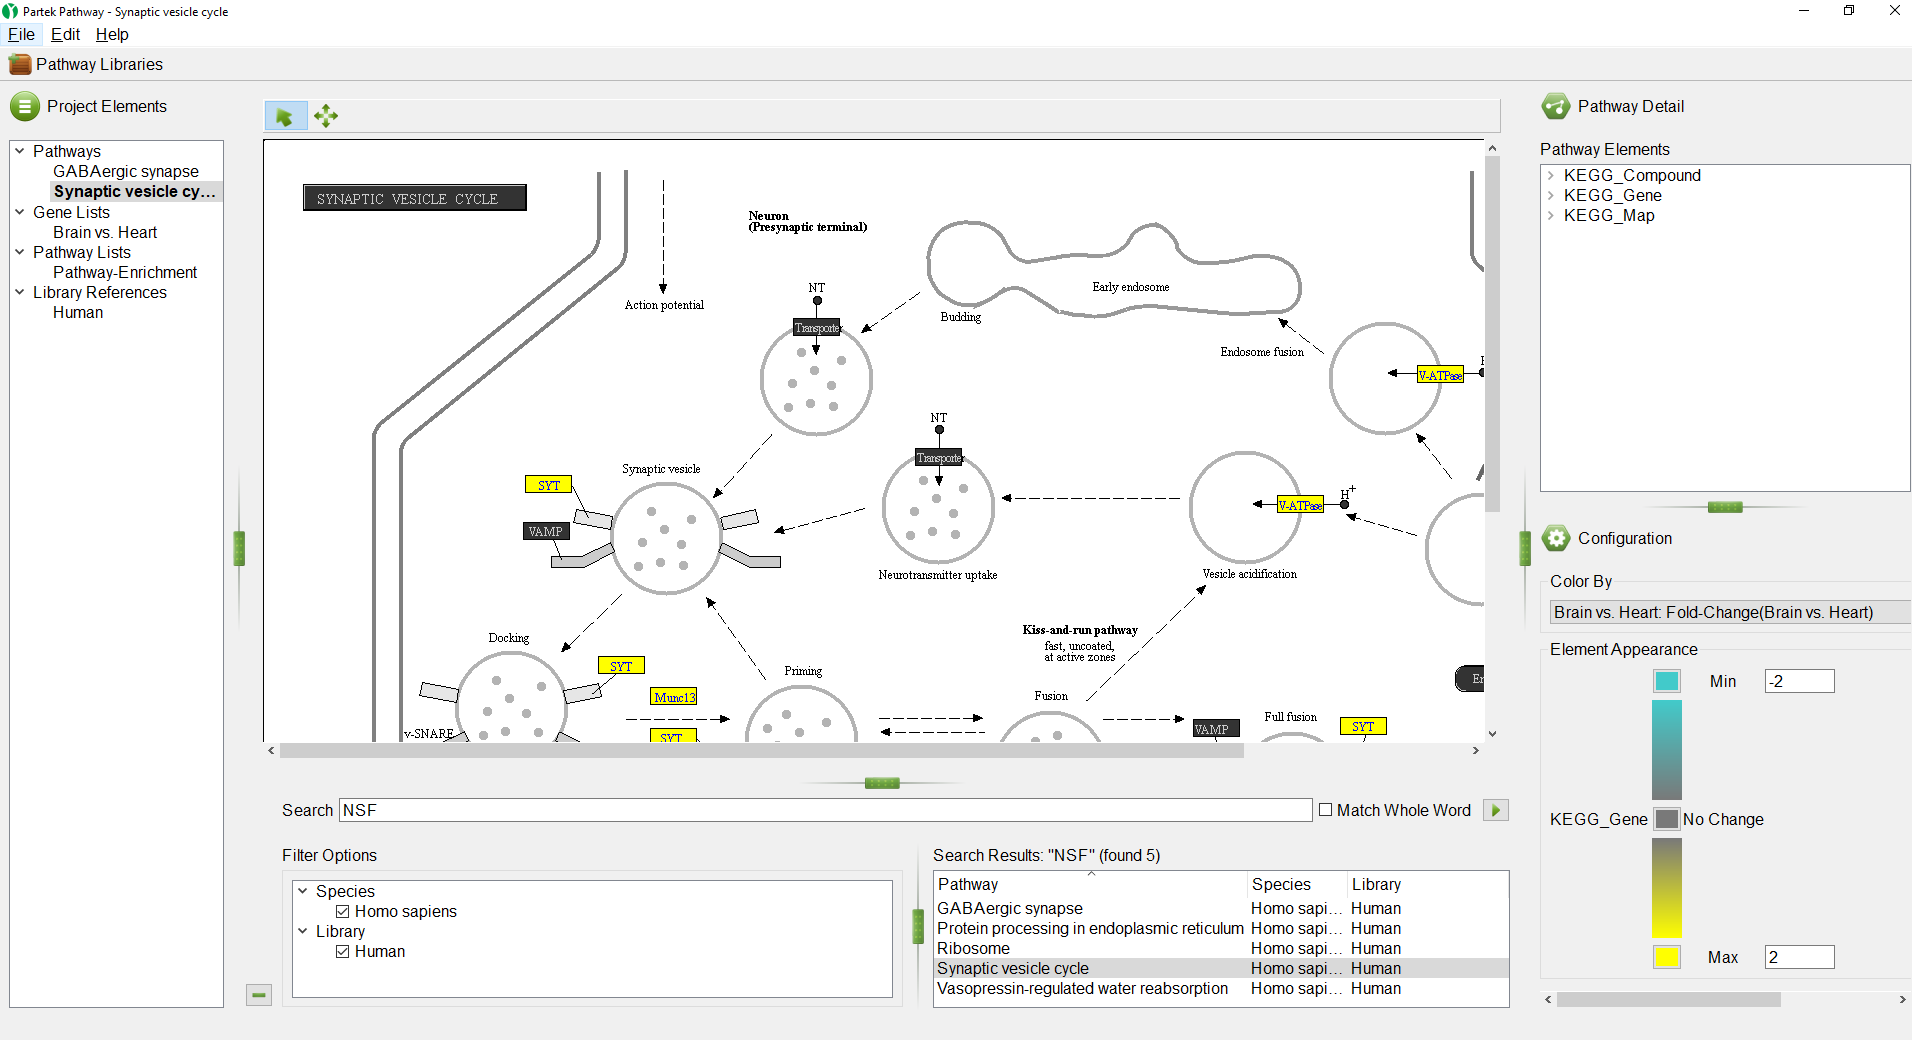 Analyzing pathway enrichment in Partek Pathway - Genomics